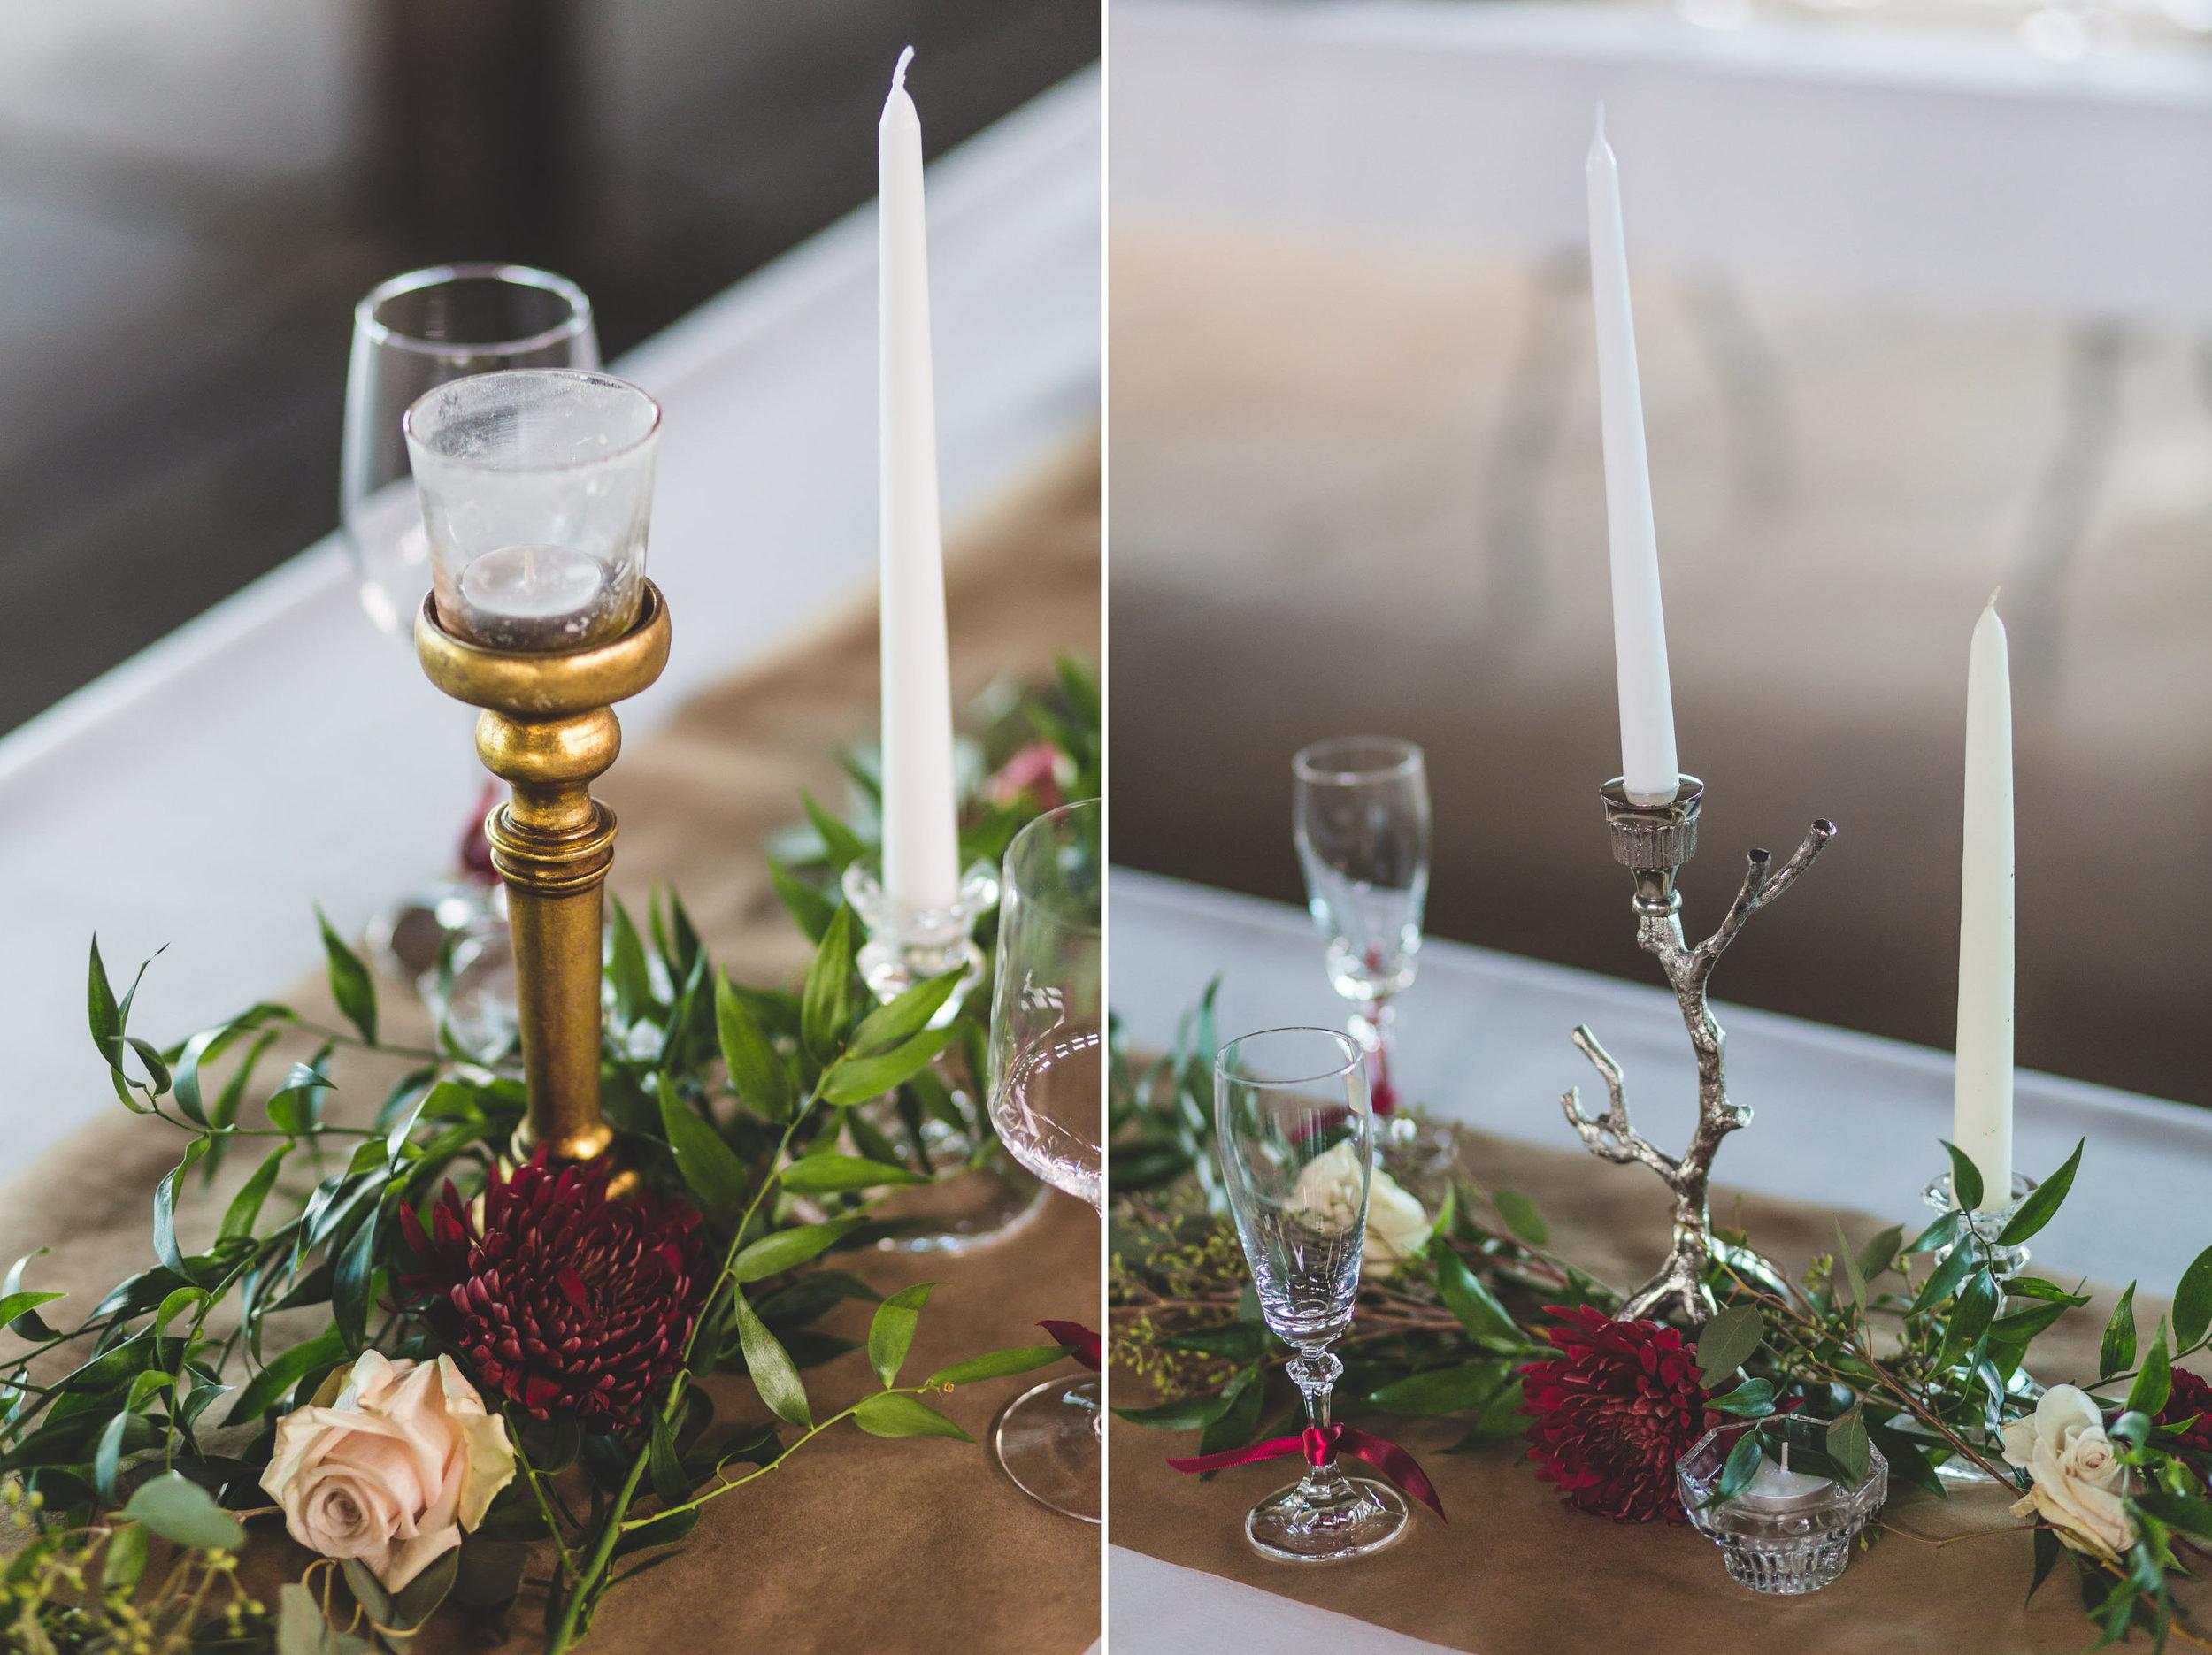 Adam-Szrmack-The-Glass-Factory-Wedding-12.jpg